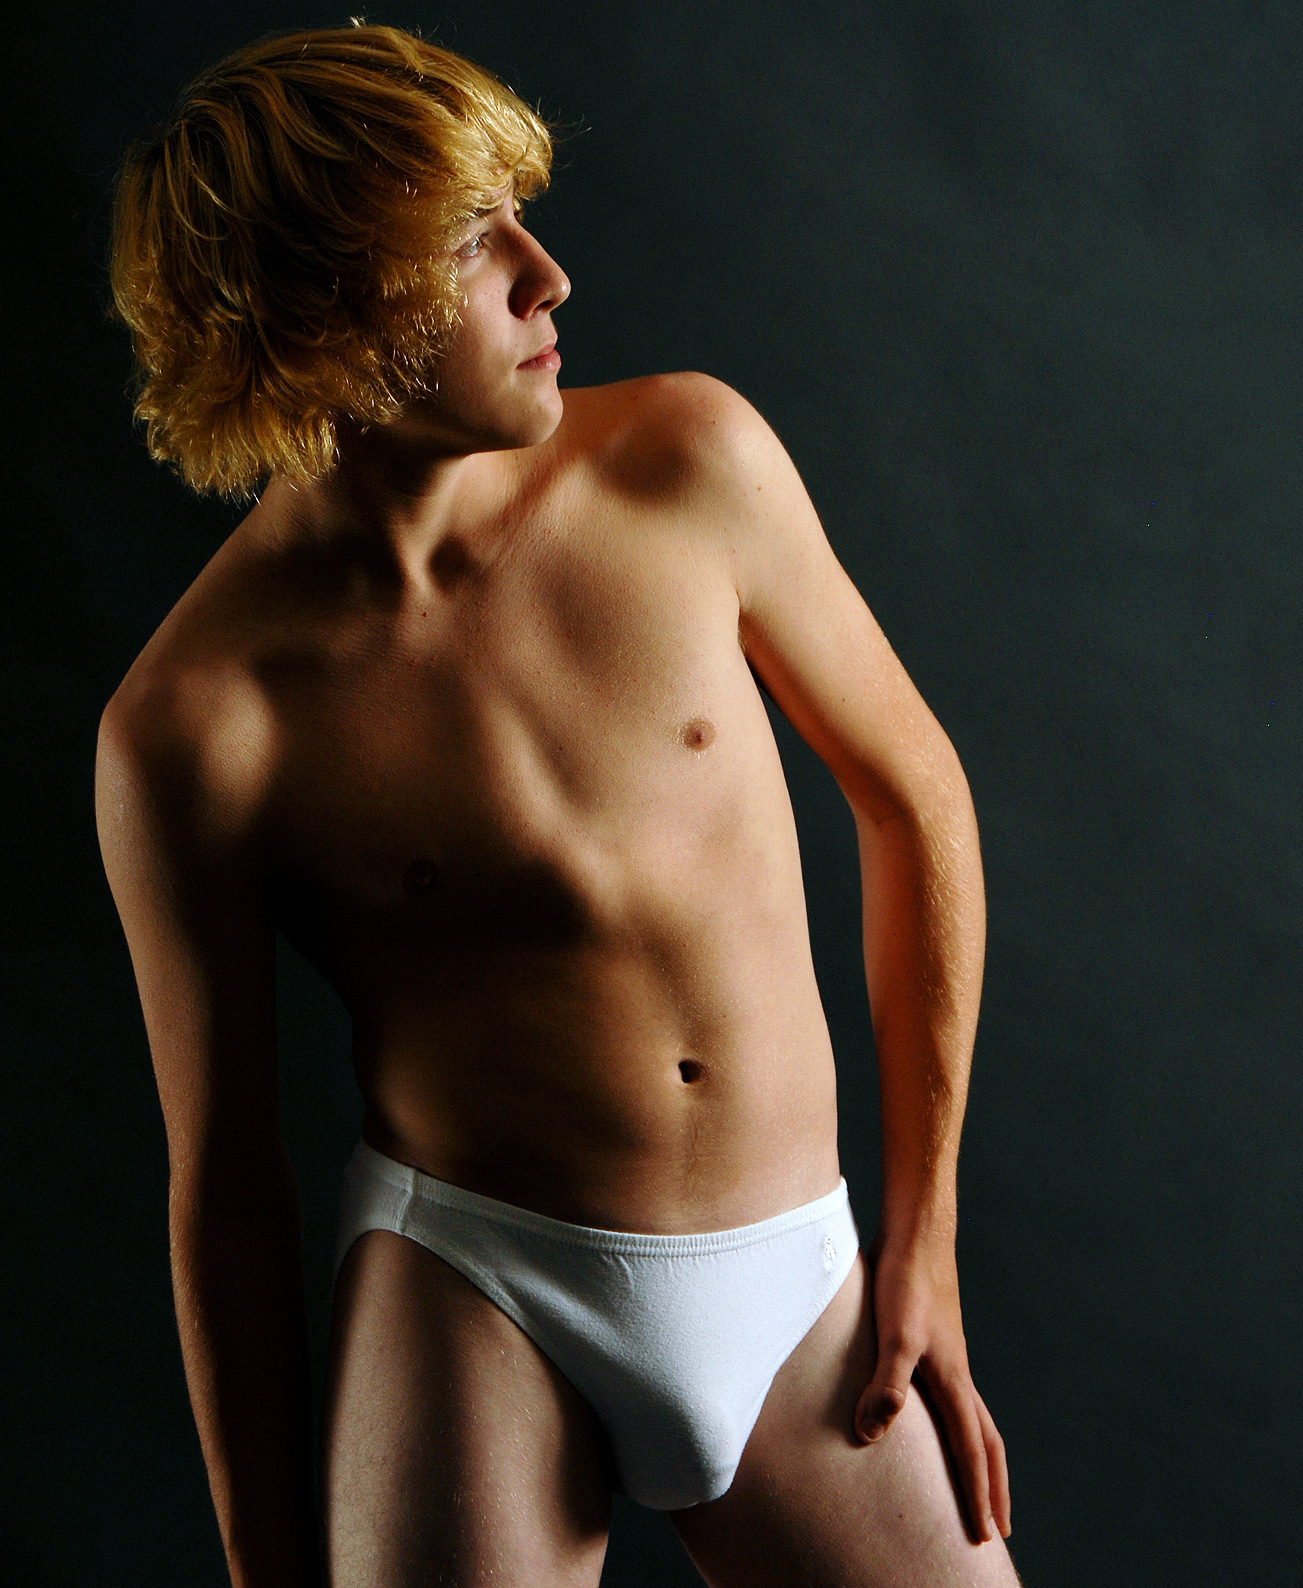 ModelTeenz – Cody M